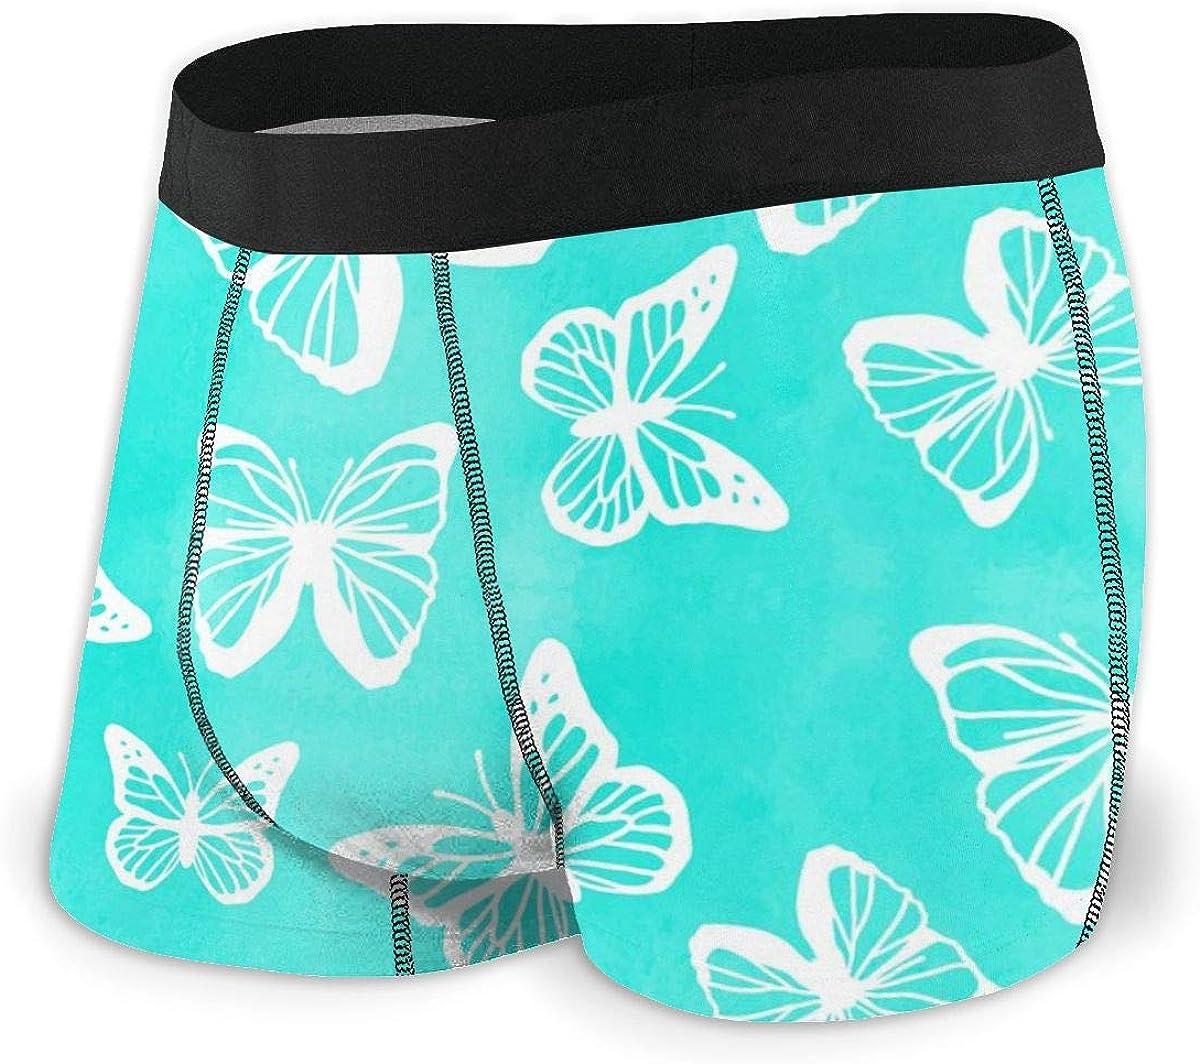 Mens Boxer Briefs Butterflies Spring Summer Turquoise Breathable Underwear